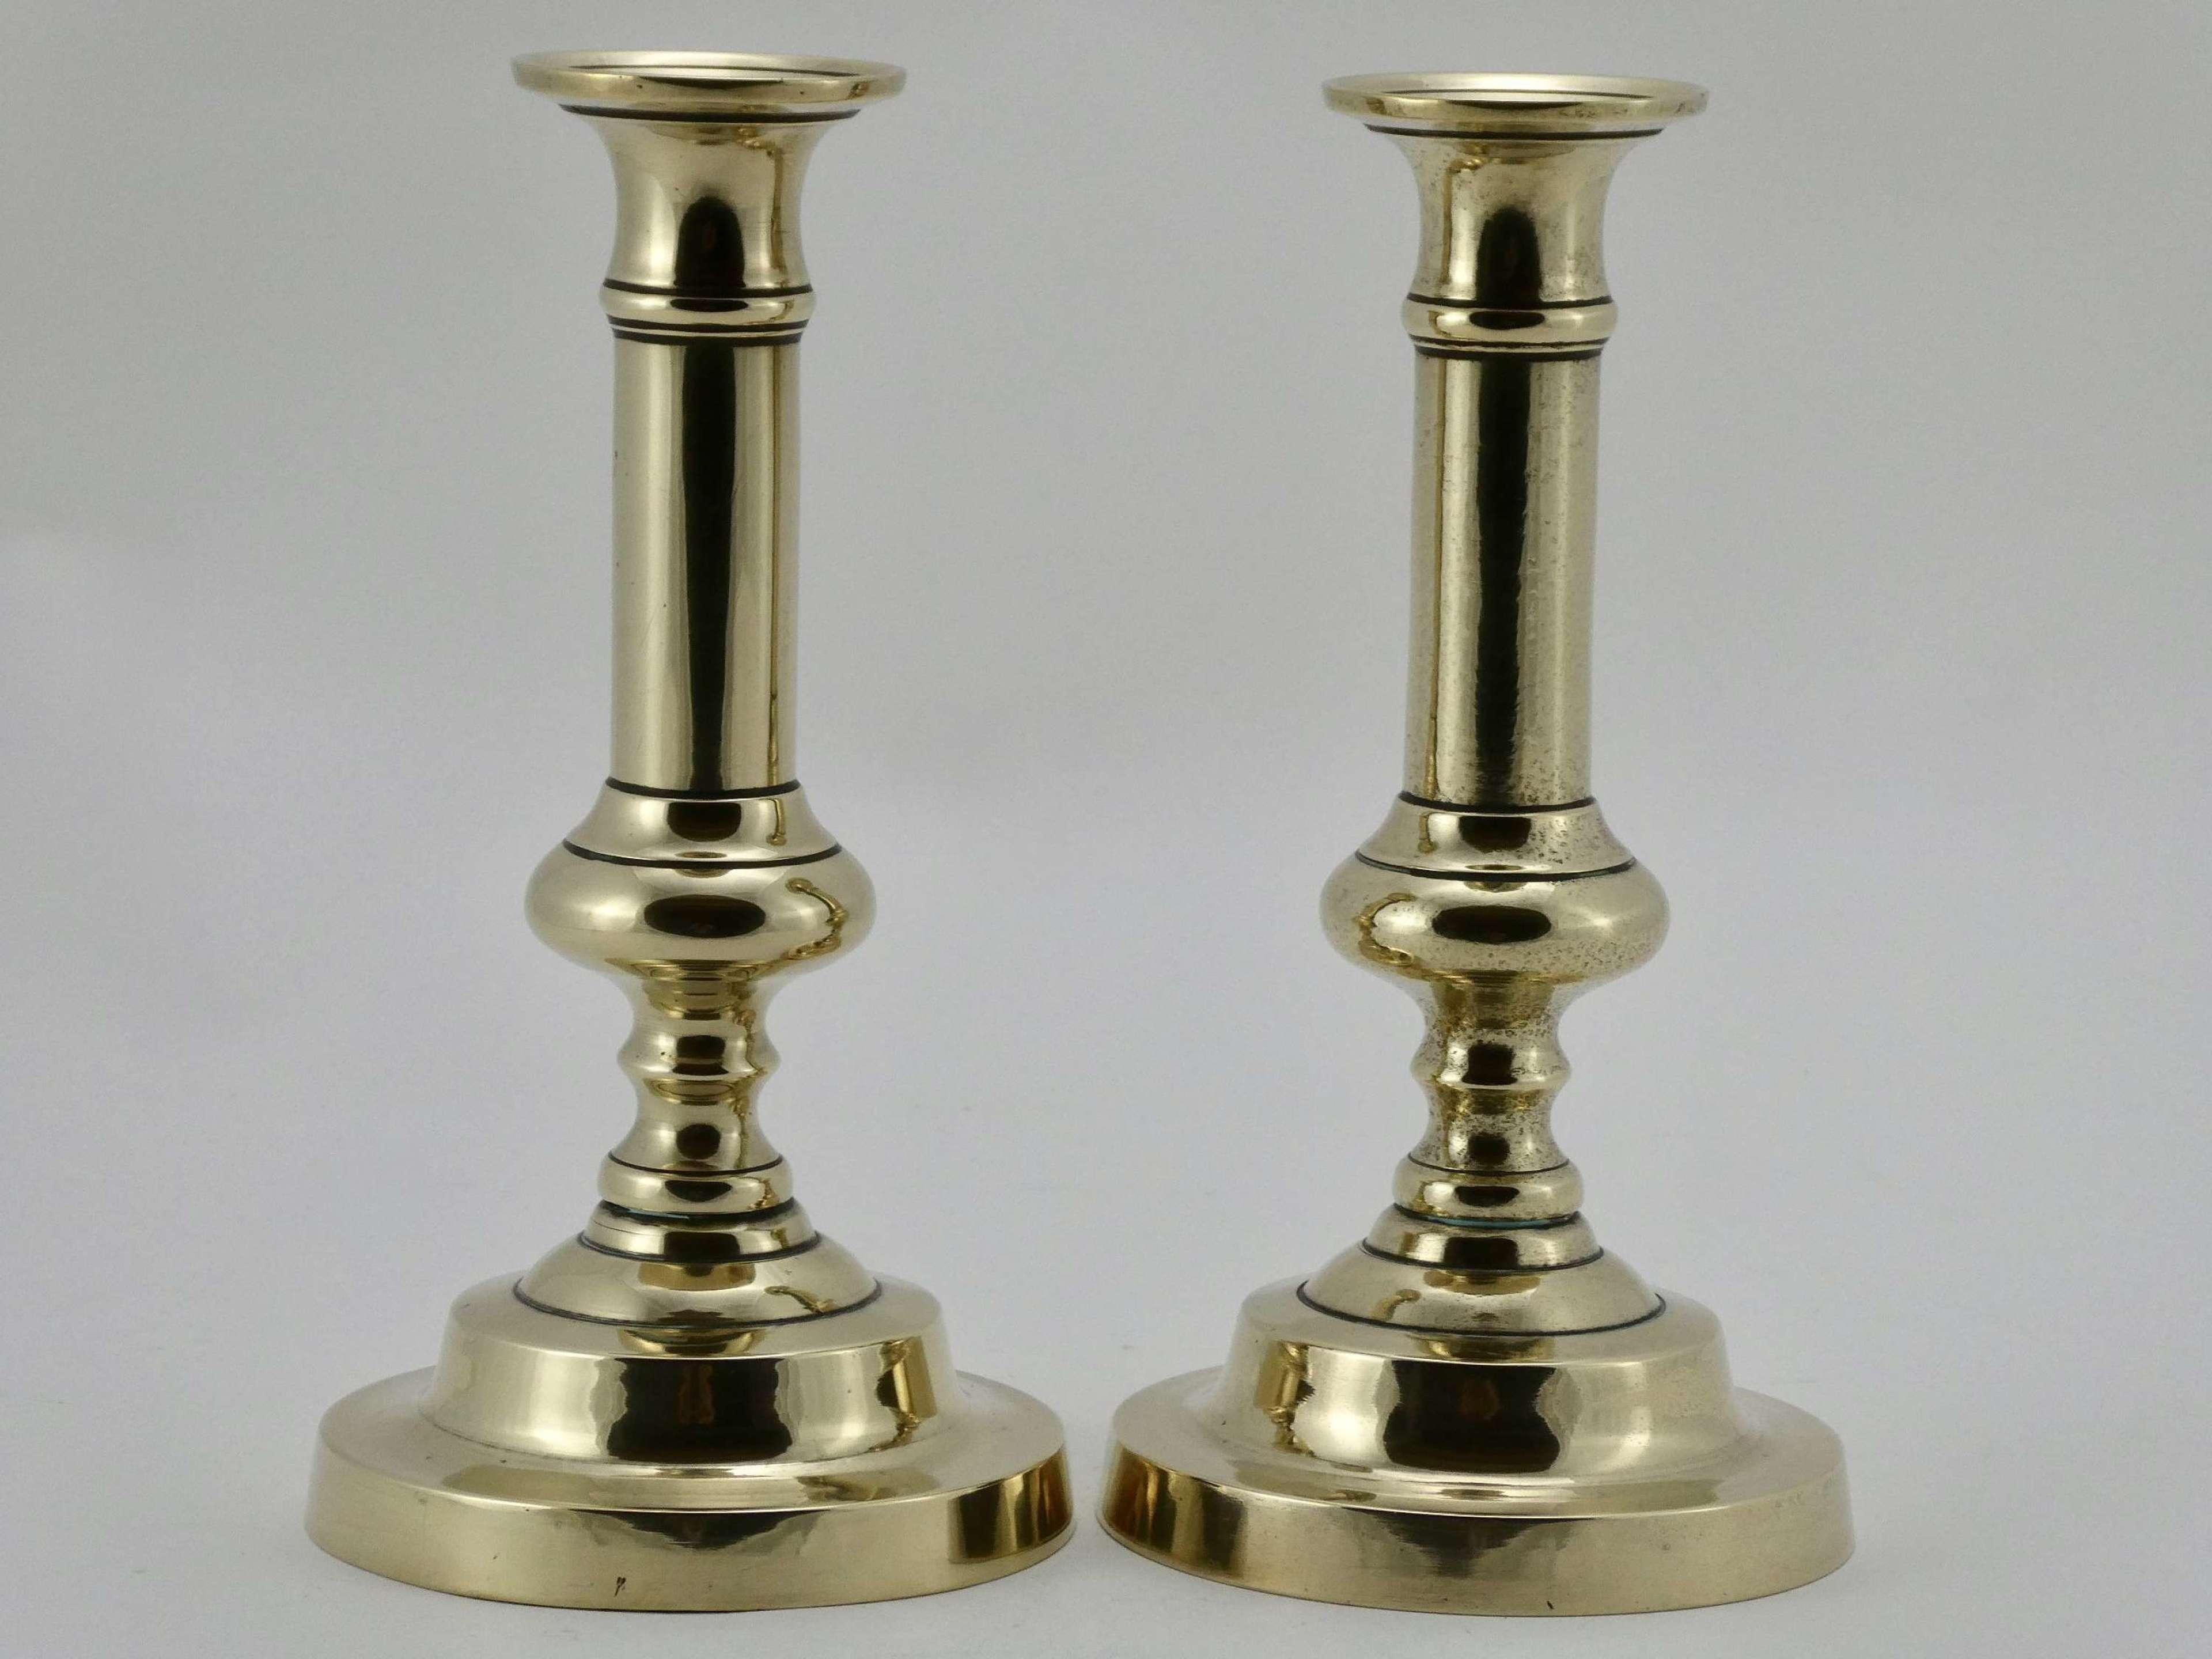 Pair of Brass Candlesticks, circa 1820